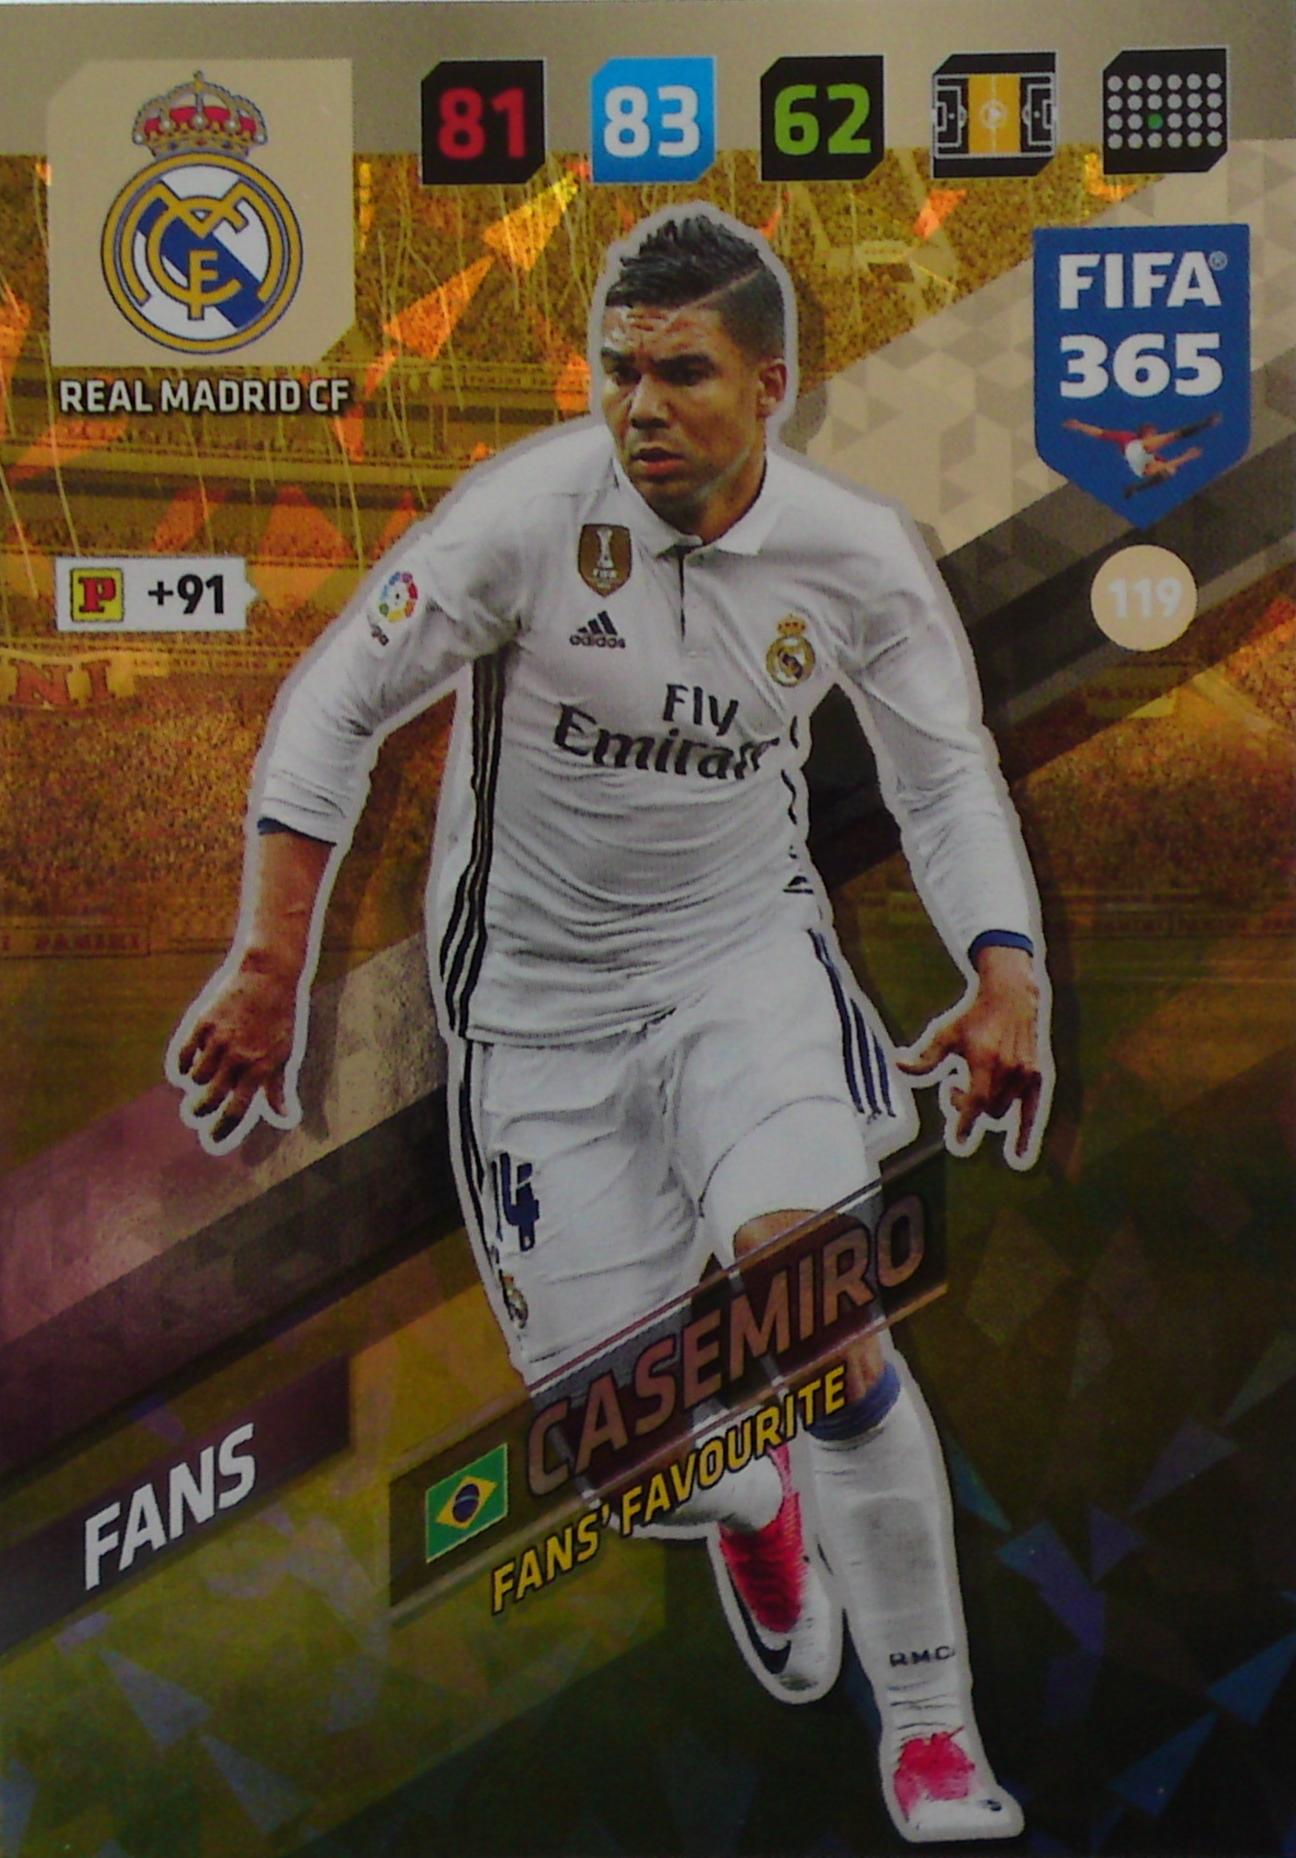 FIFA 365 2018 Fans Favourite CASEMIRO 119